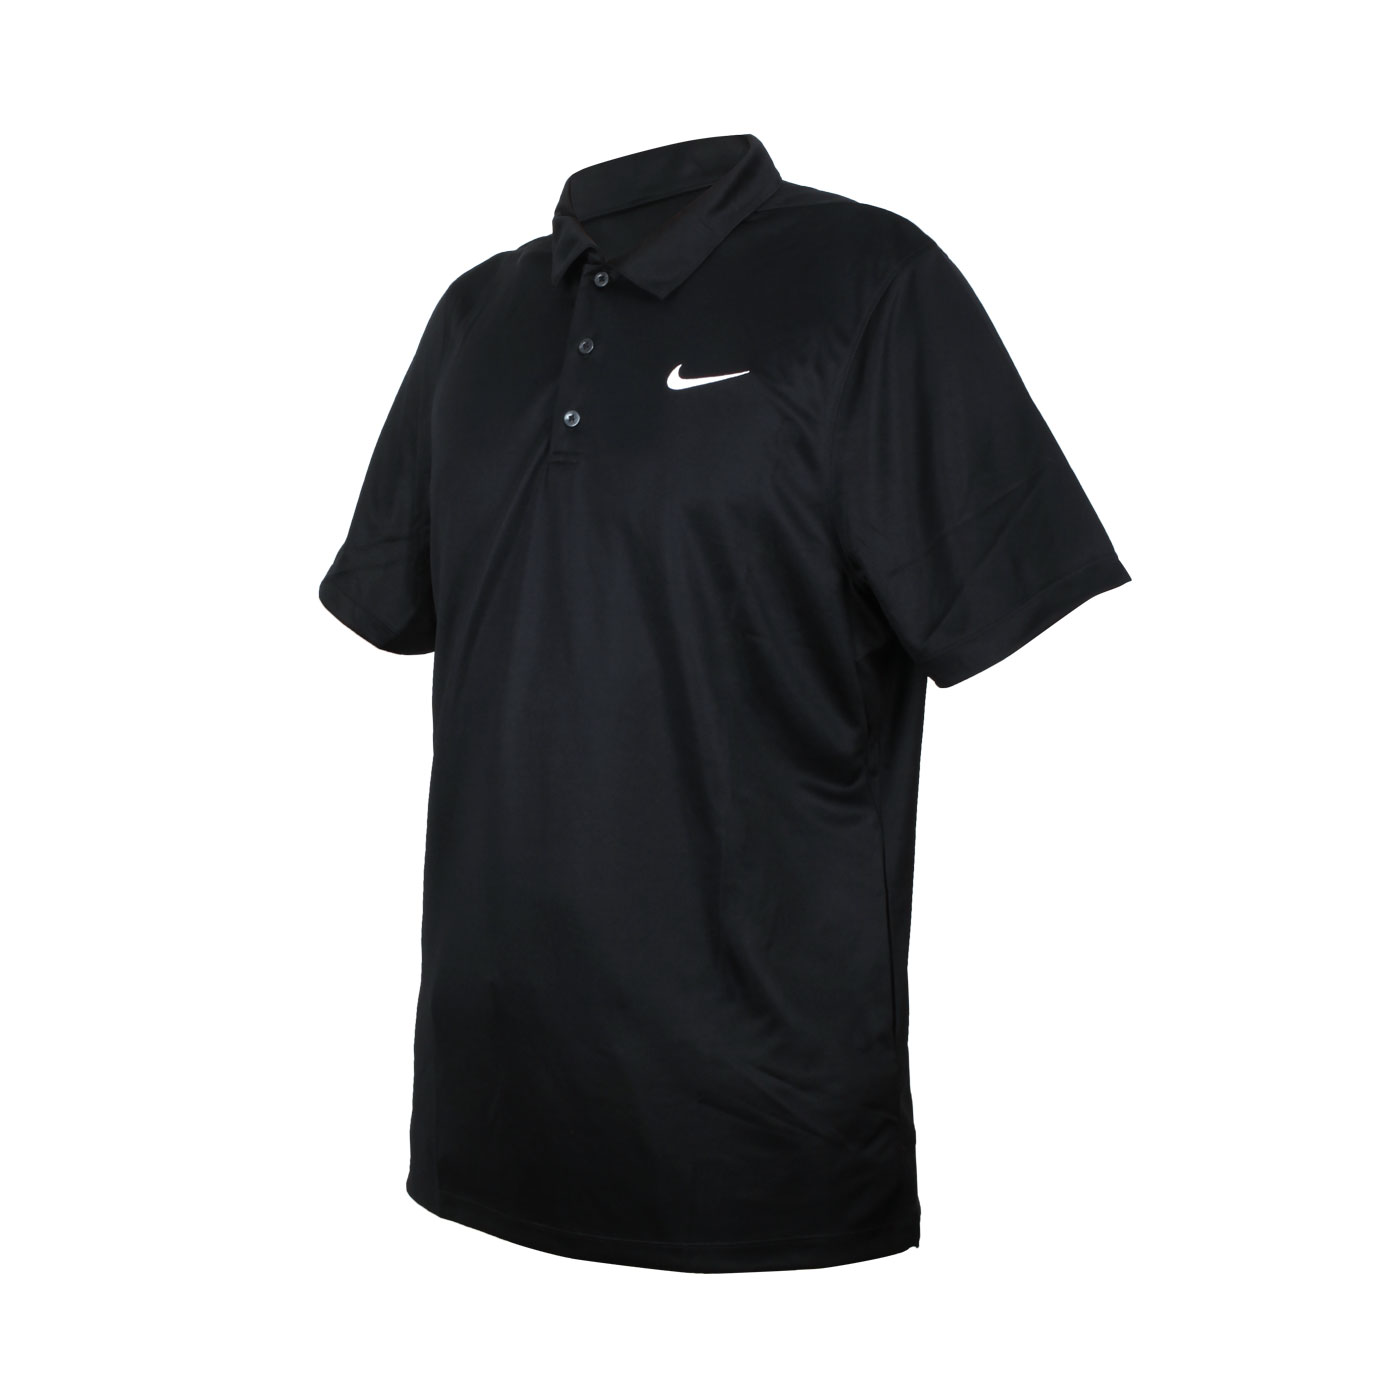 NIKE 男款短袖POLO衫 APS080-010 - 黑白